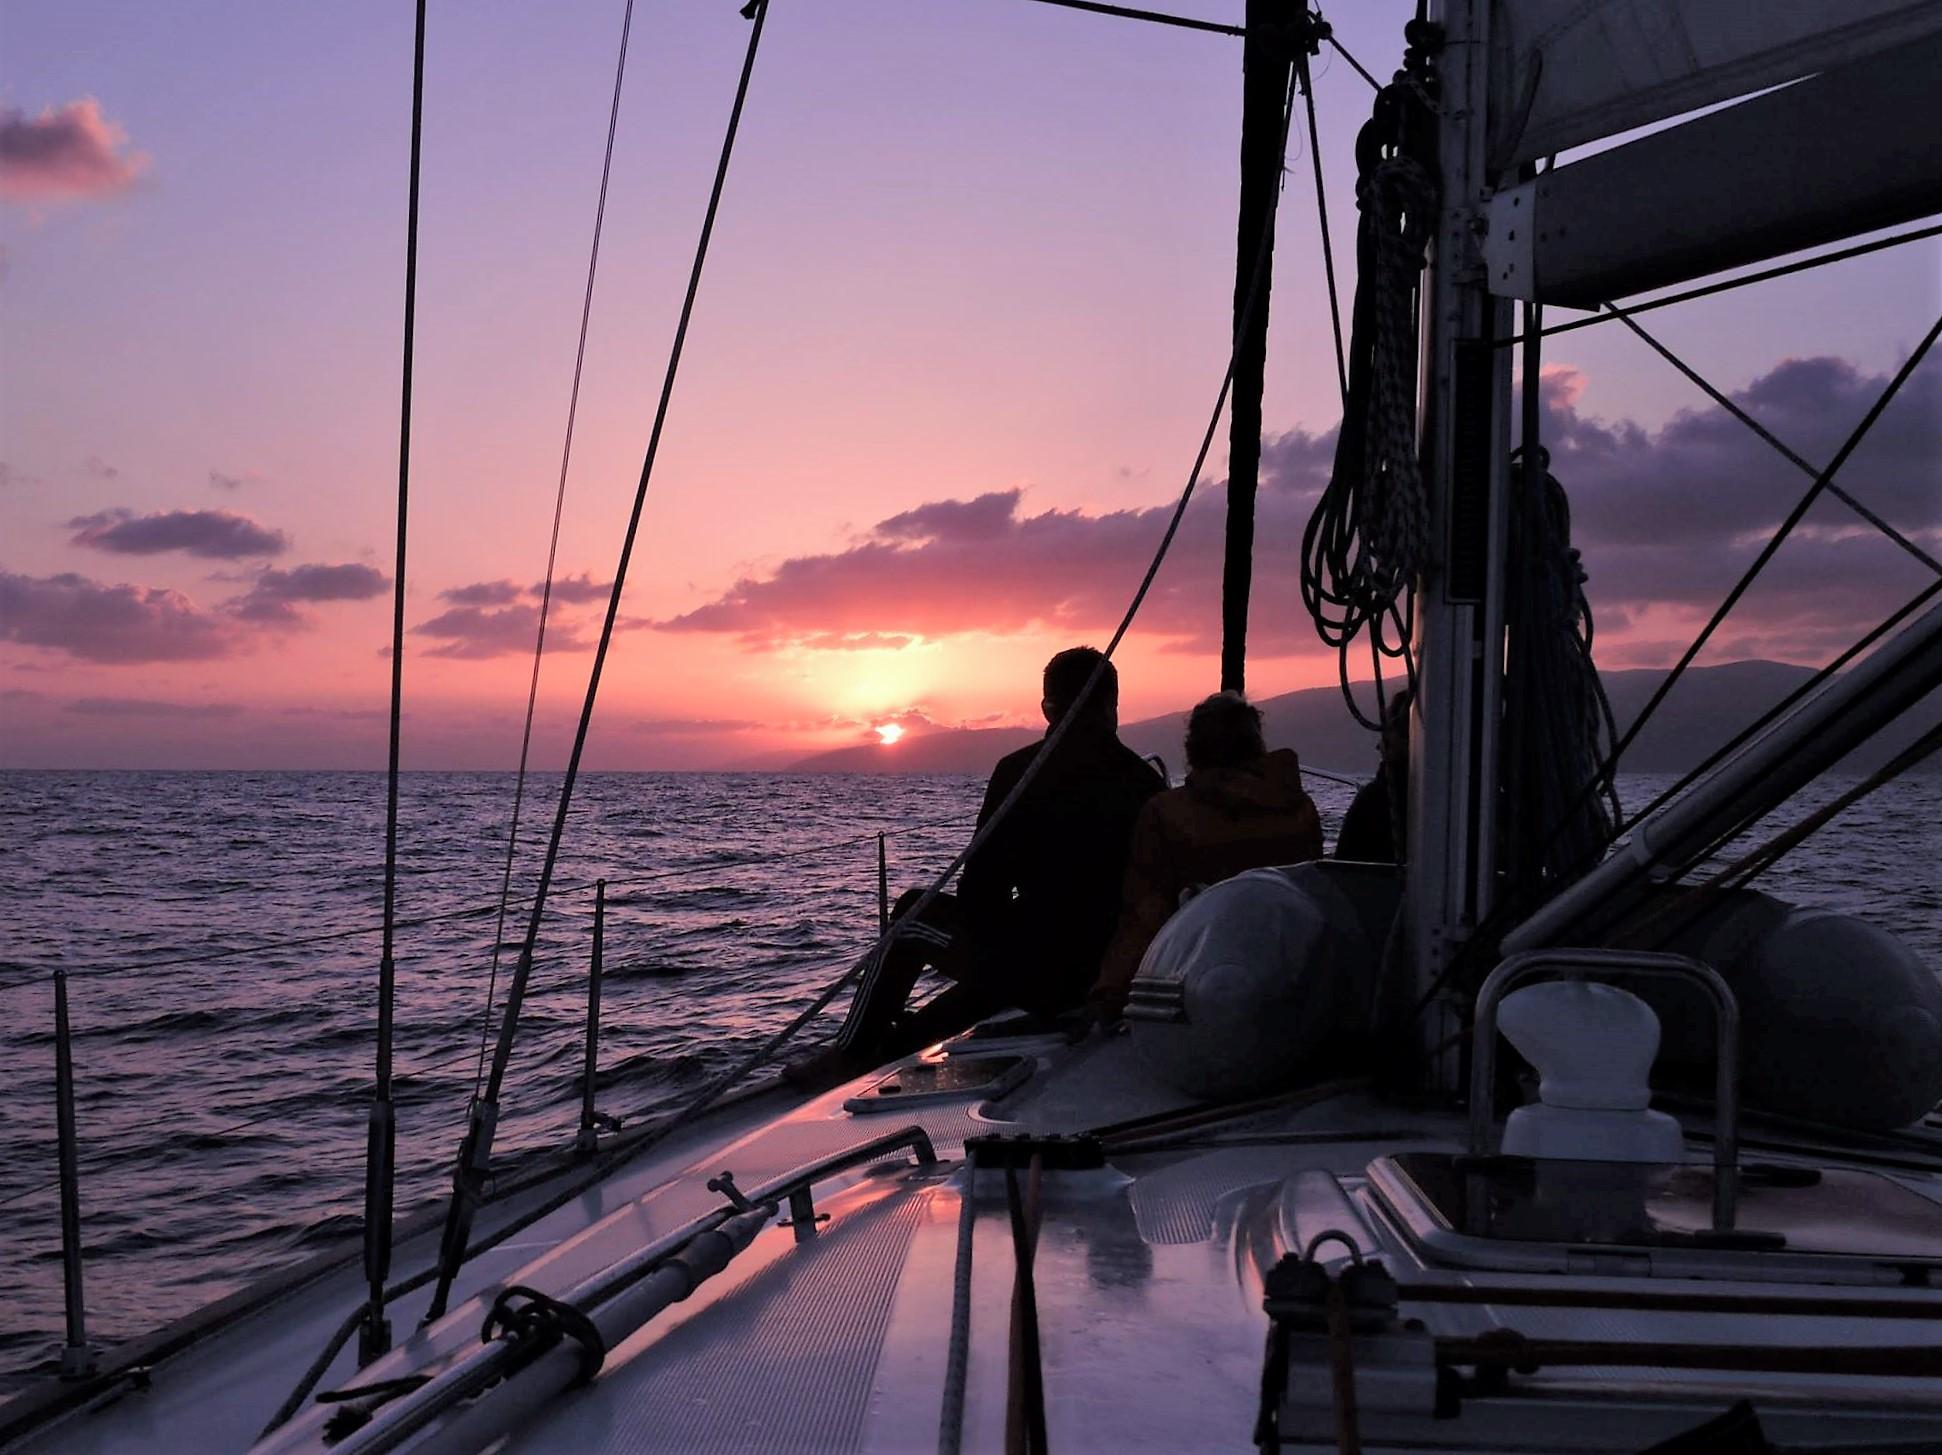 Sejltur i solnedgangen